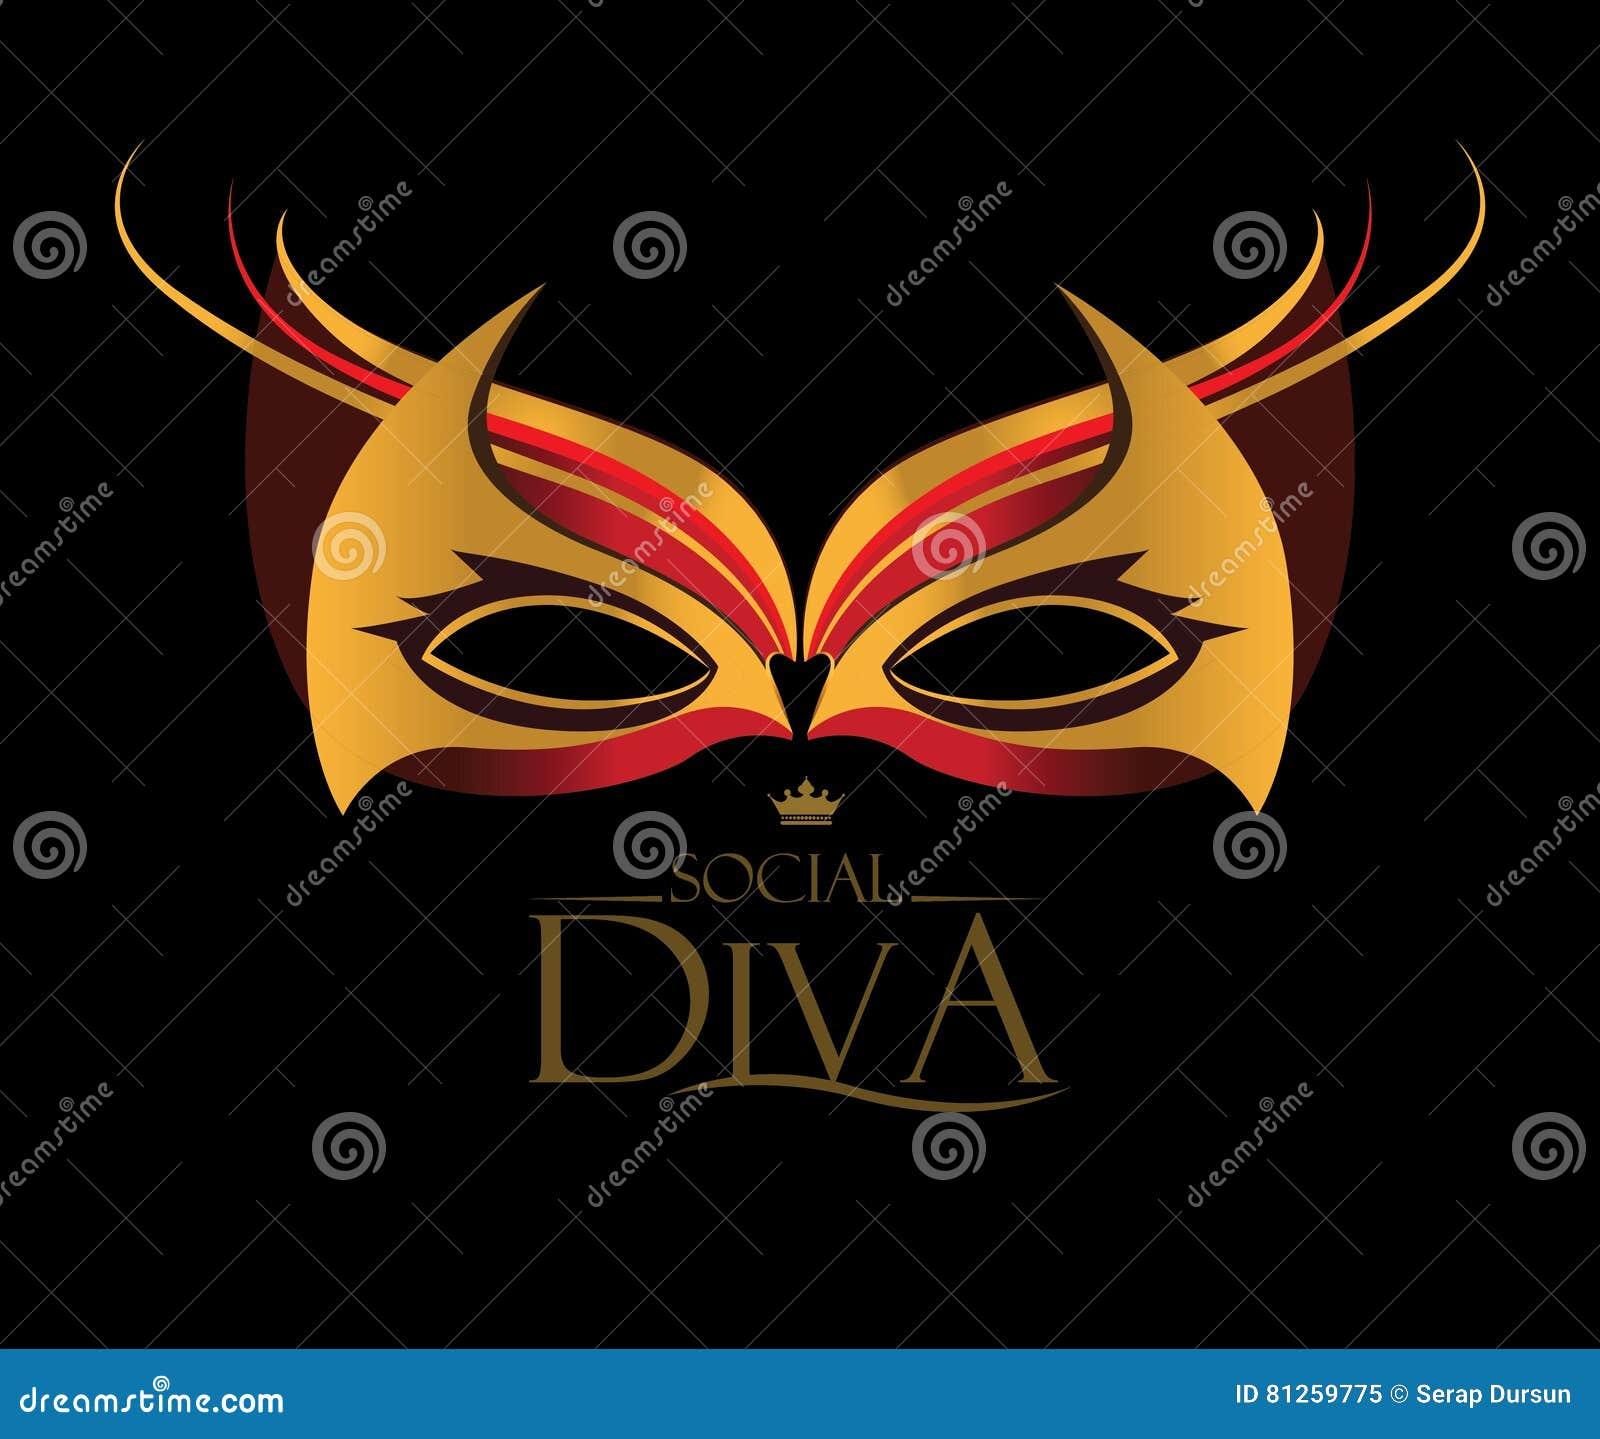 Diva Design: Diva Logo Design Cartoon Vector